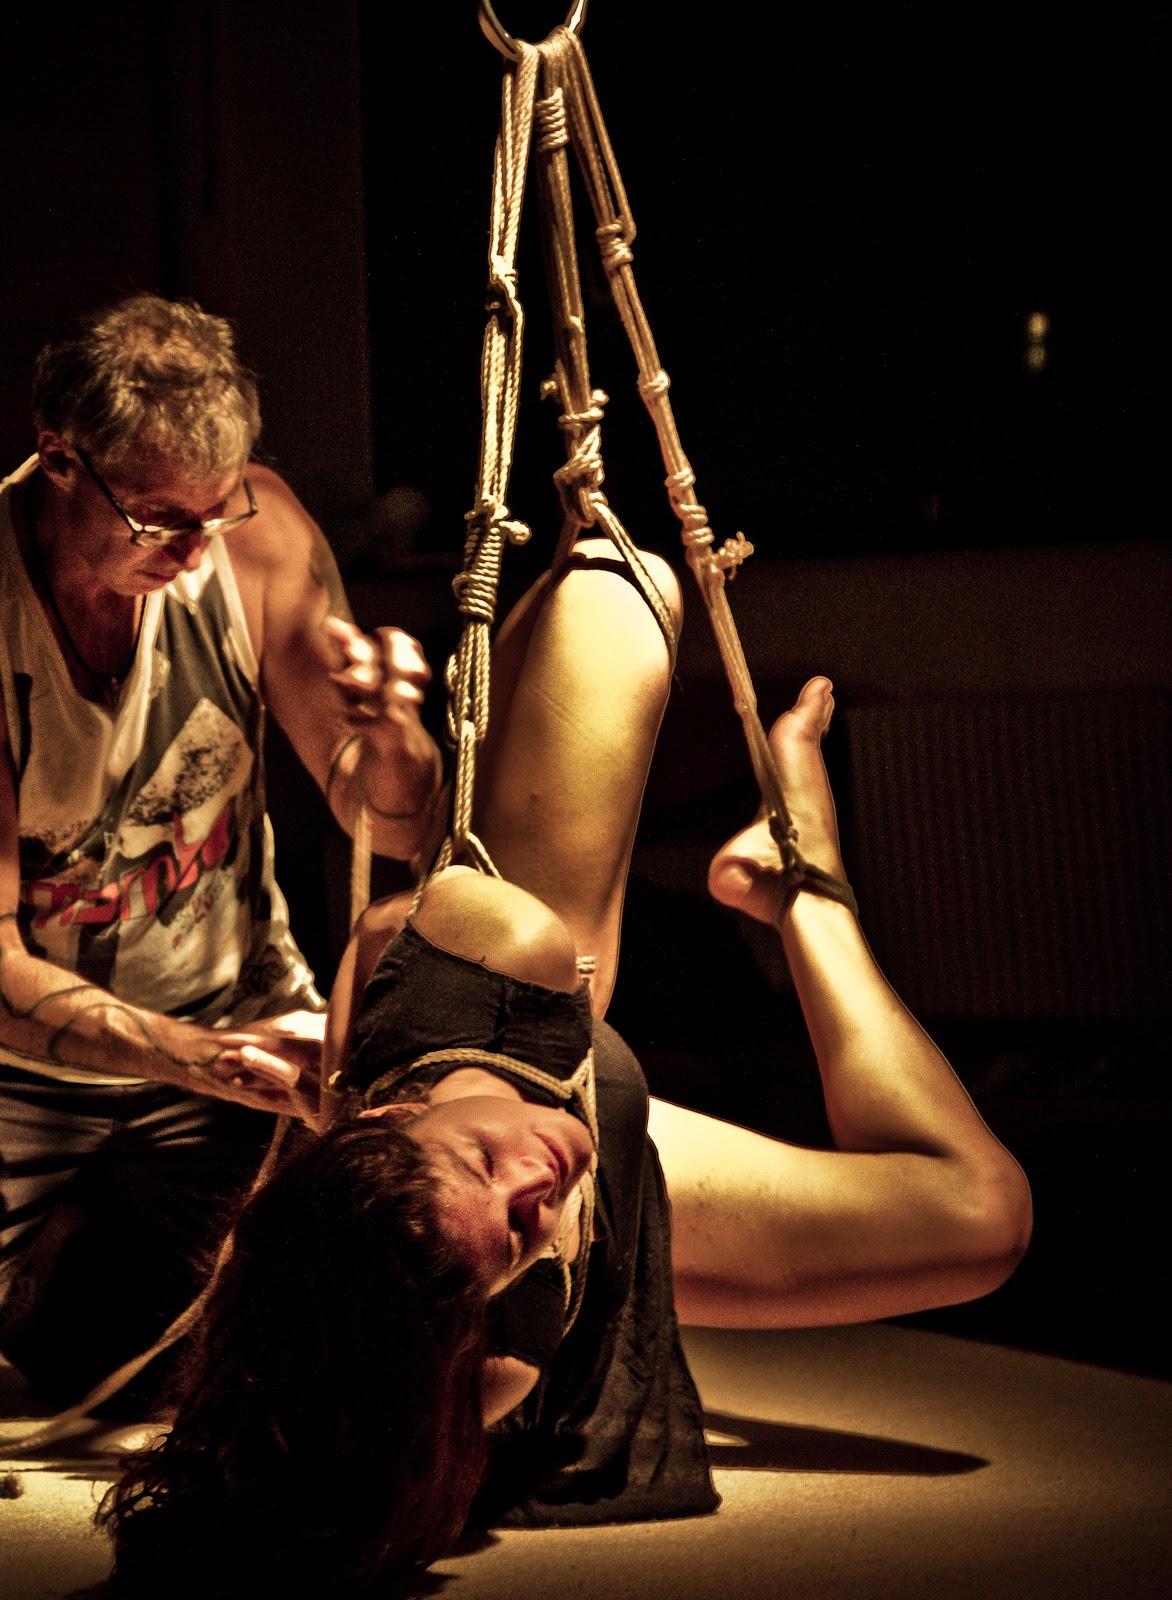 göteborg massage escort utan kondom